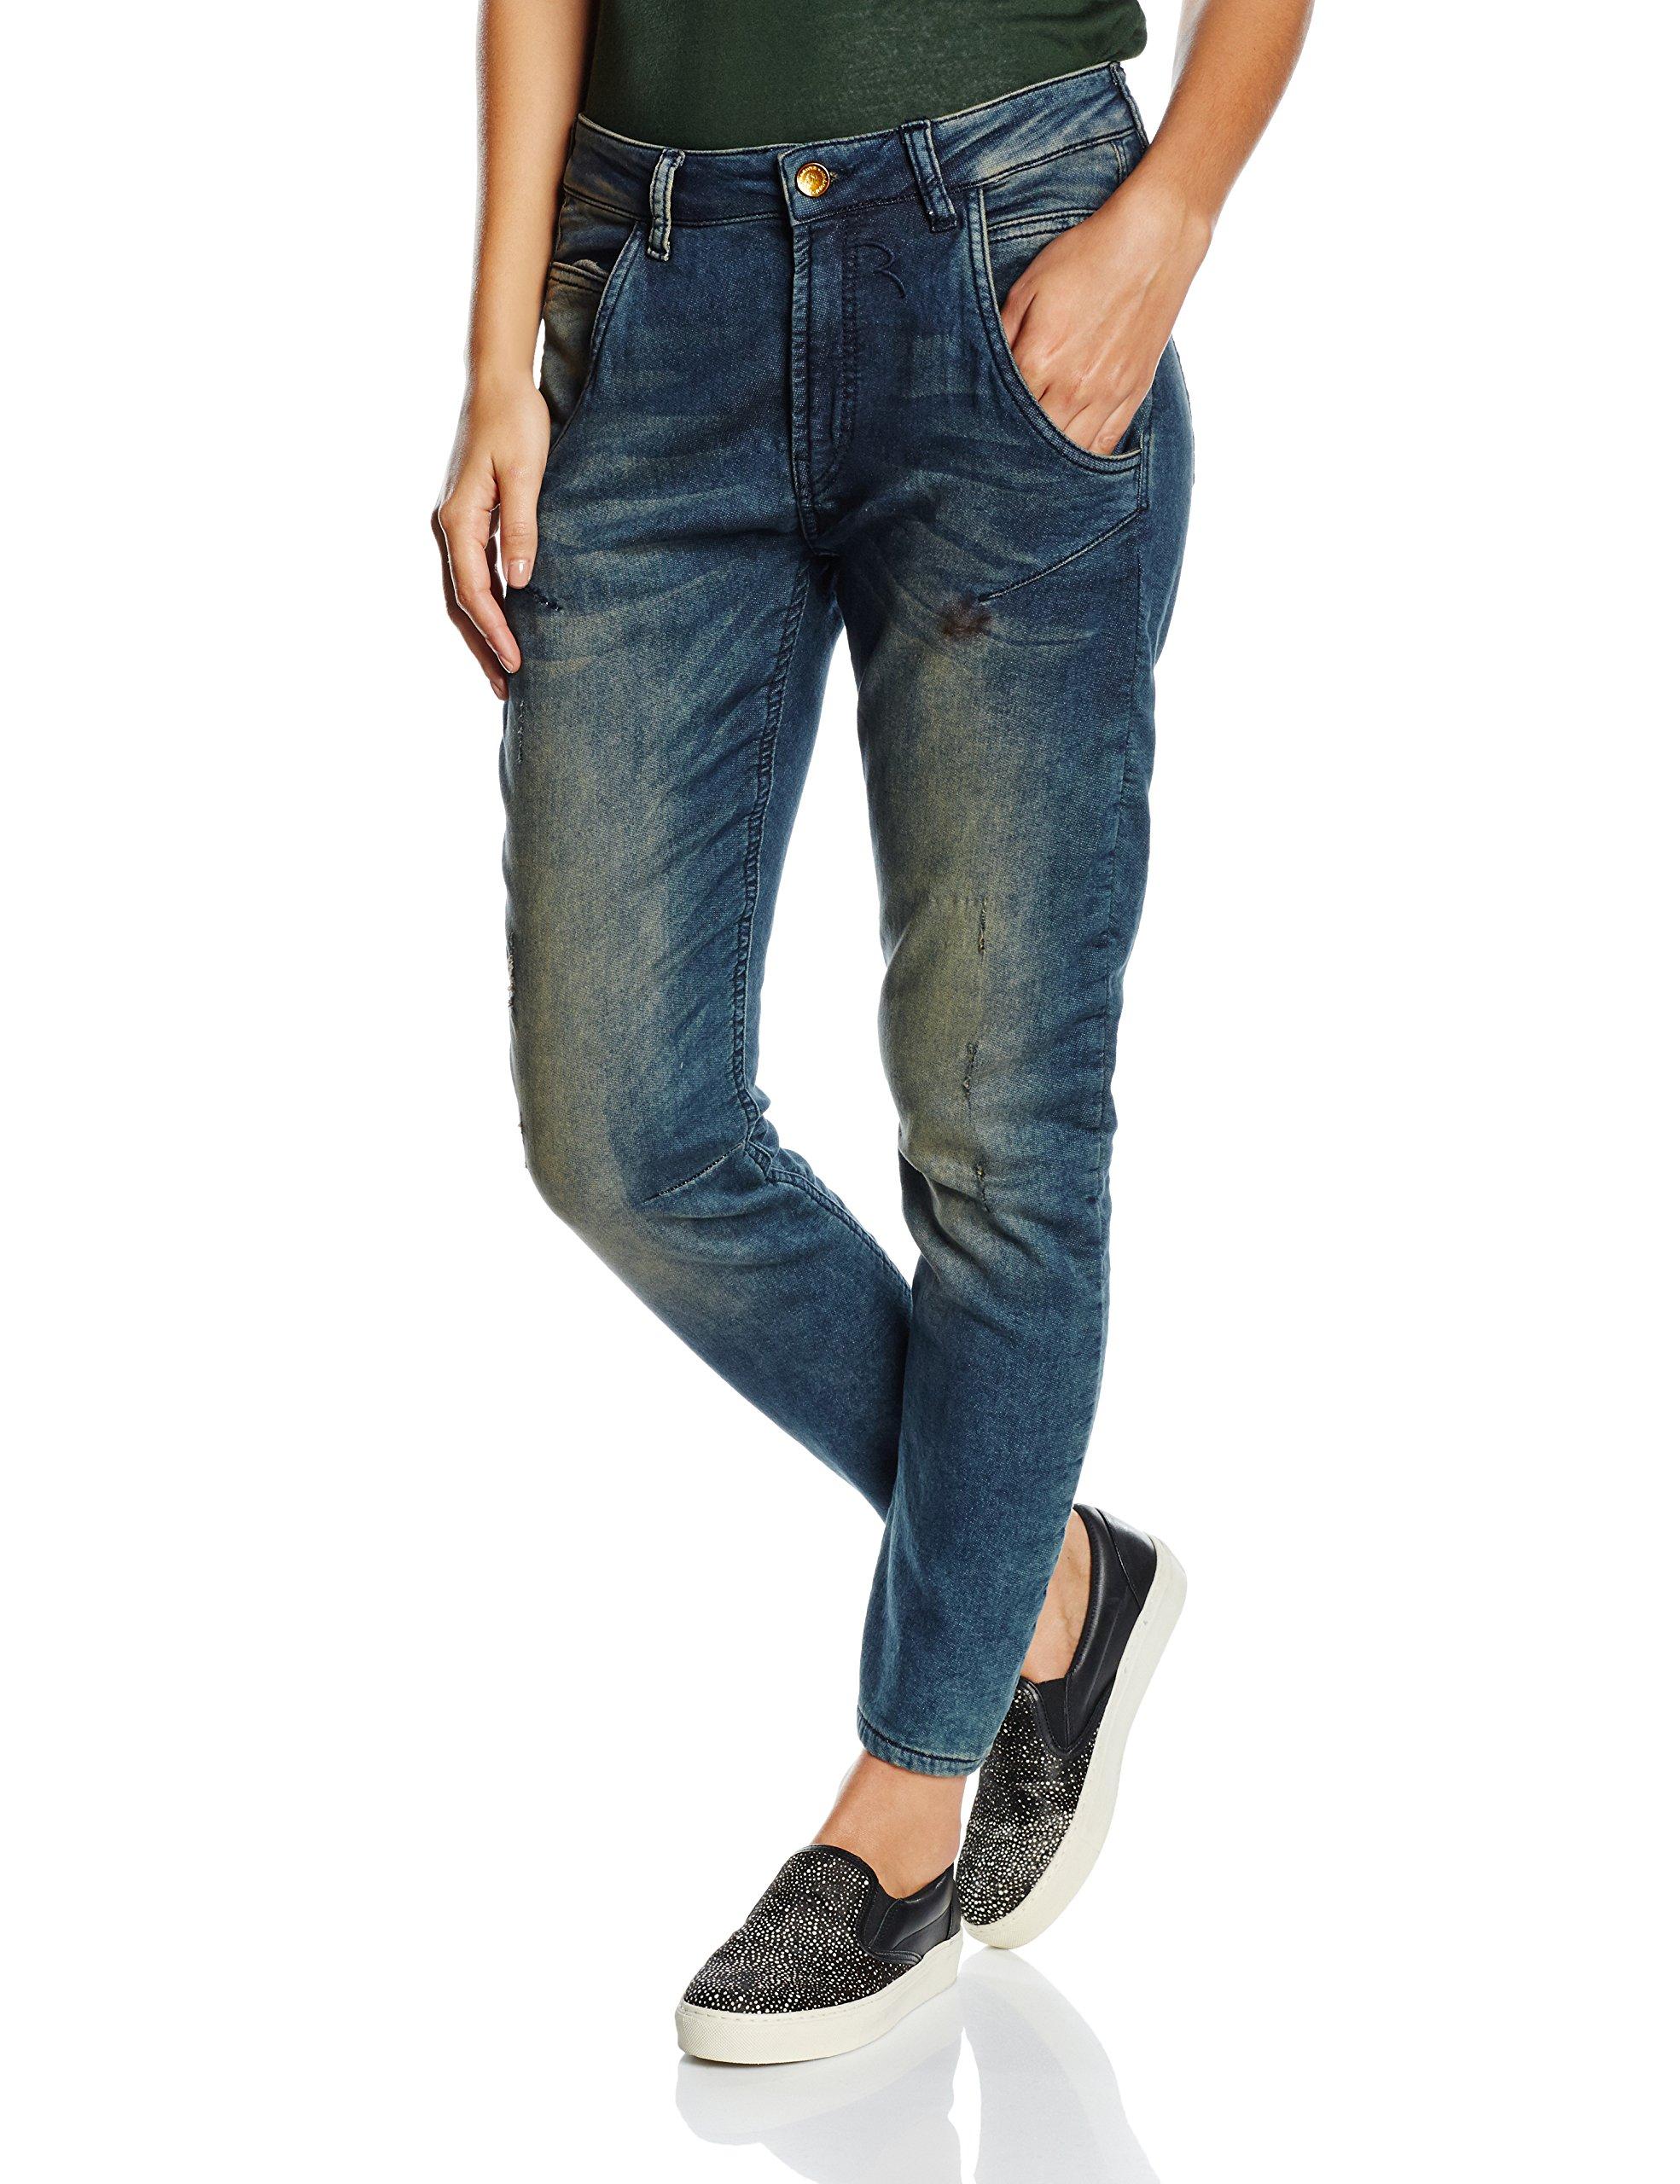 Rich FemmeBleudenim 54q952Jeans l32taille Blue amp;royal 700W26 Fabricant26 rxQCWdoBeE